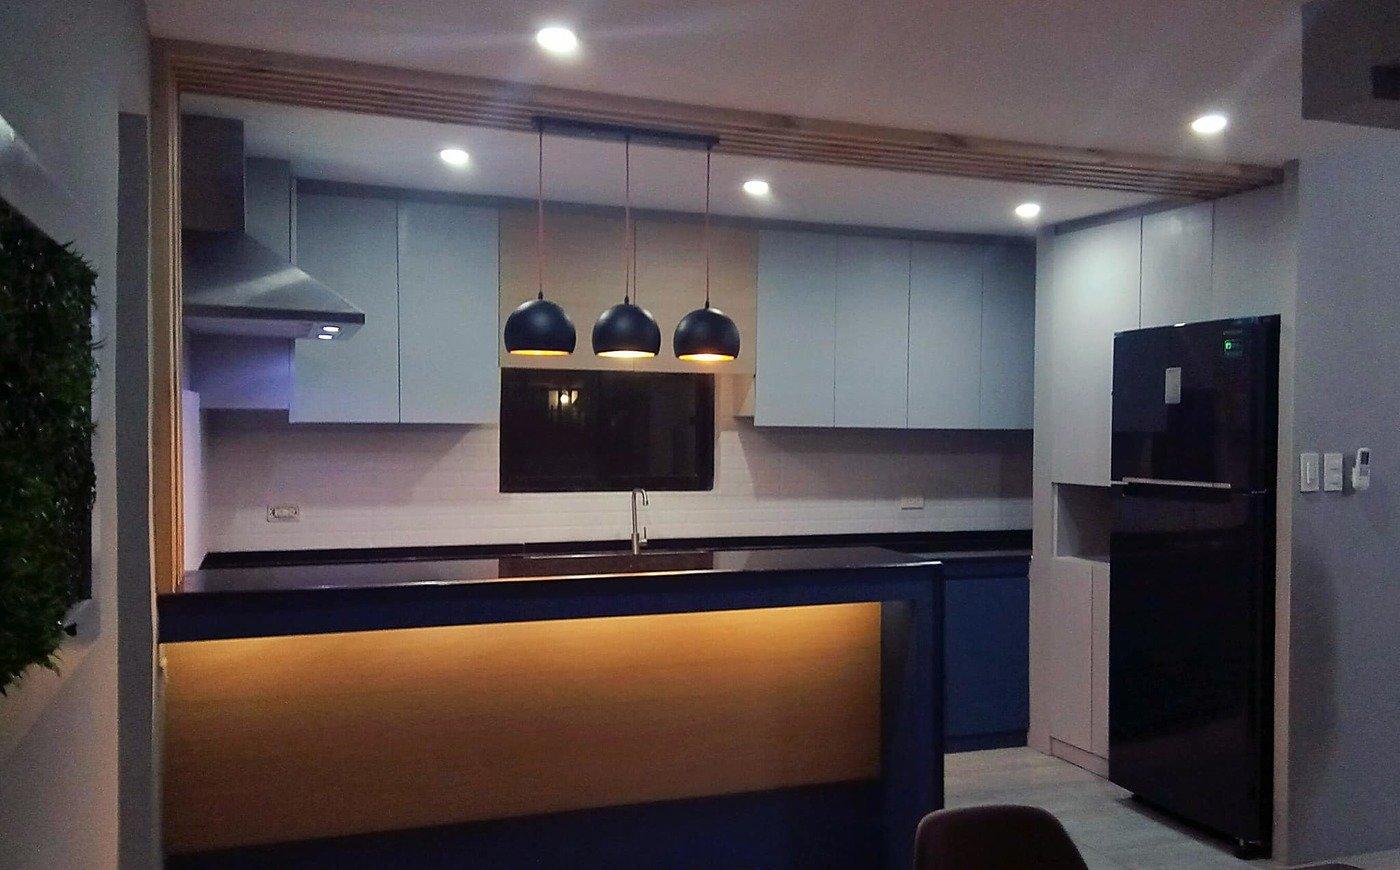 Kitchen Interior At Angeles Pampanga By Aztecs Architectural Services At Coroflot Com